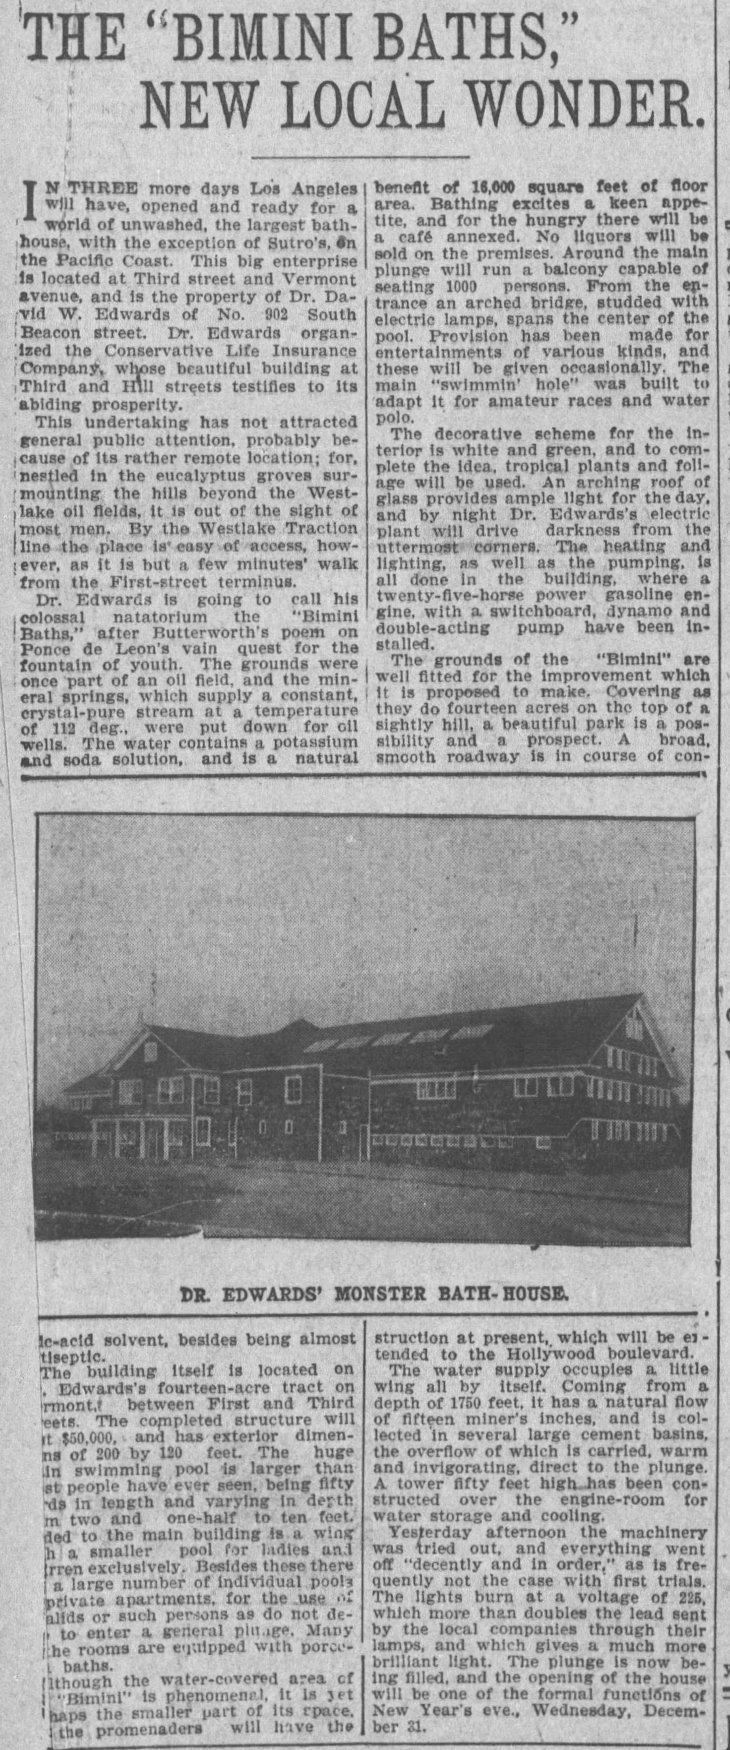 Bimini Local Wonder The_Los_Angeles_Times_Sun__Dec_28__1902_